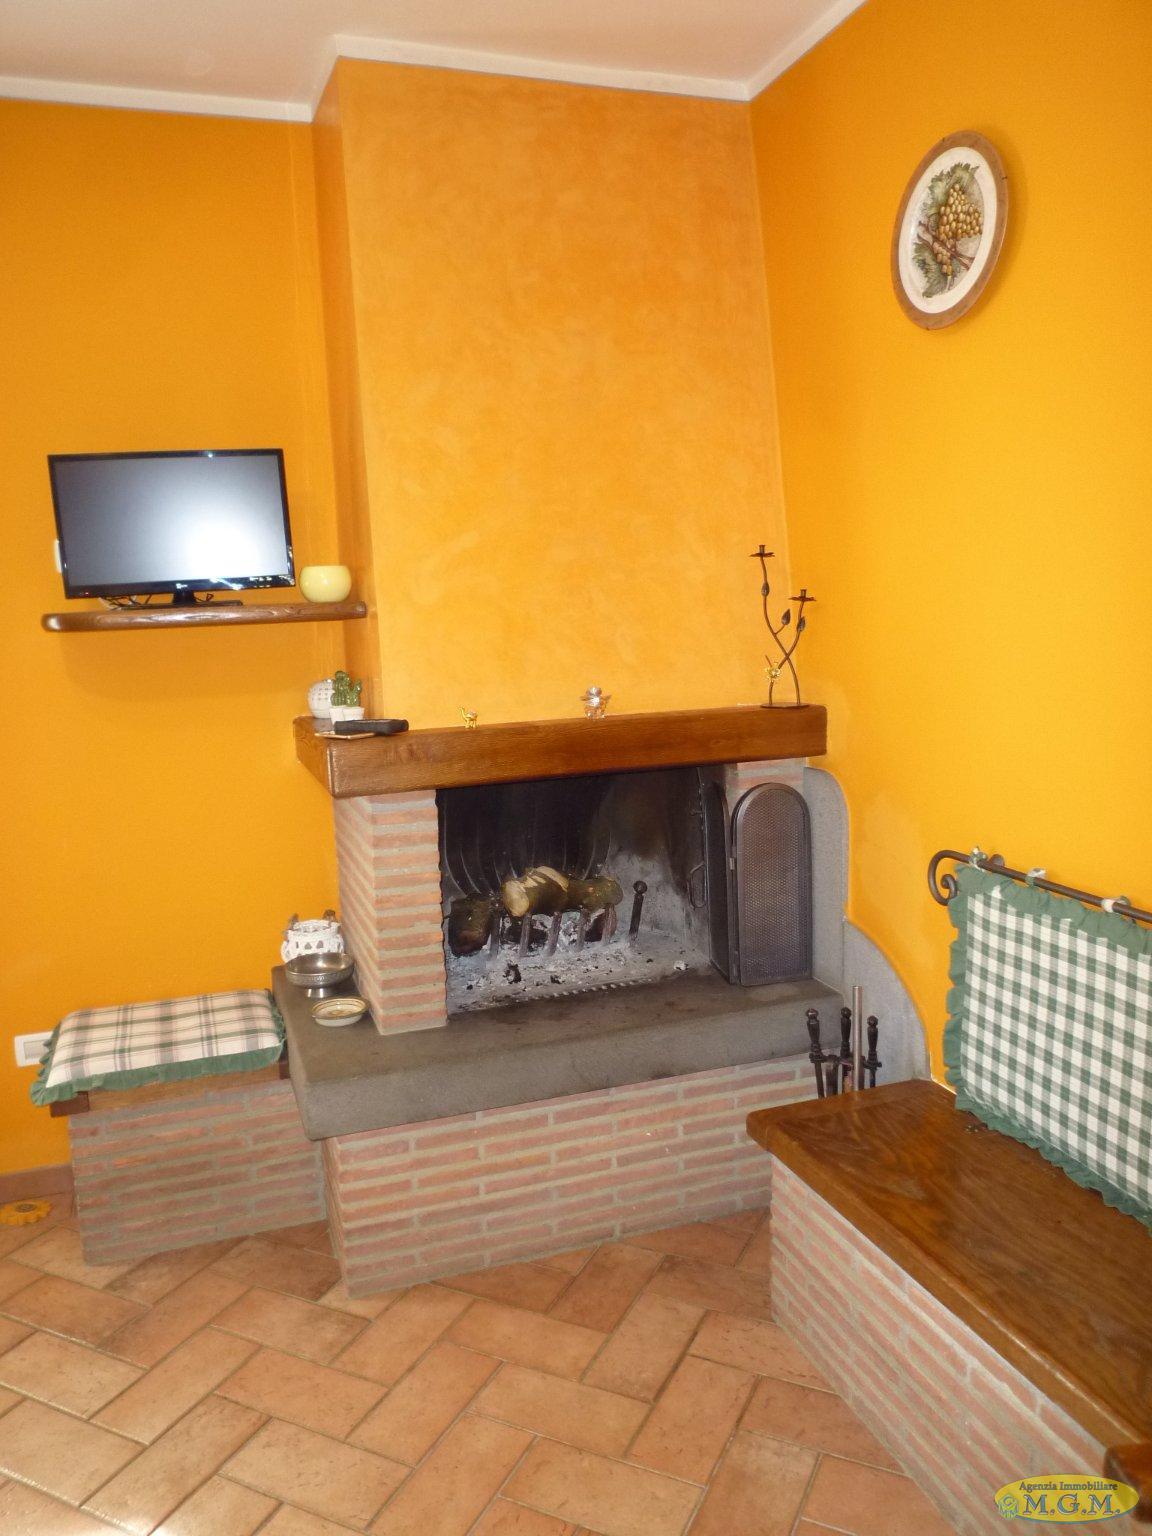 Mgmnet.it: Villetta a schiera in vendita a Montopoli in Val d'Arno